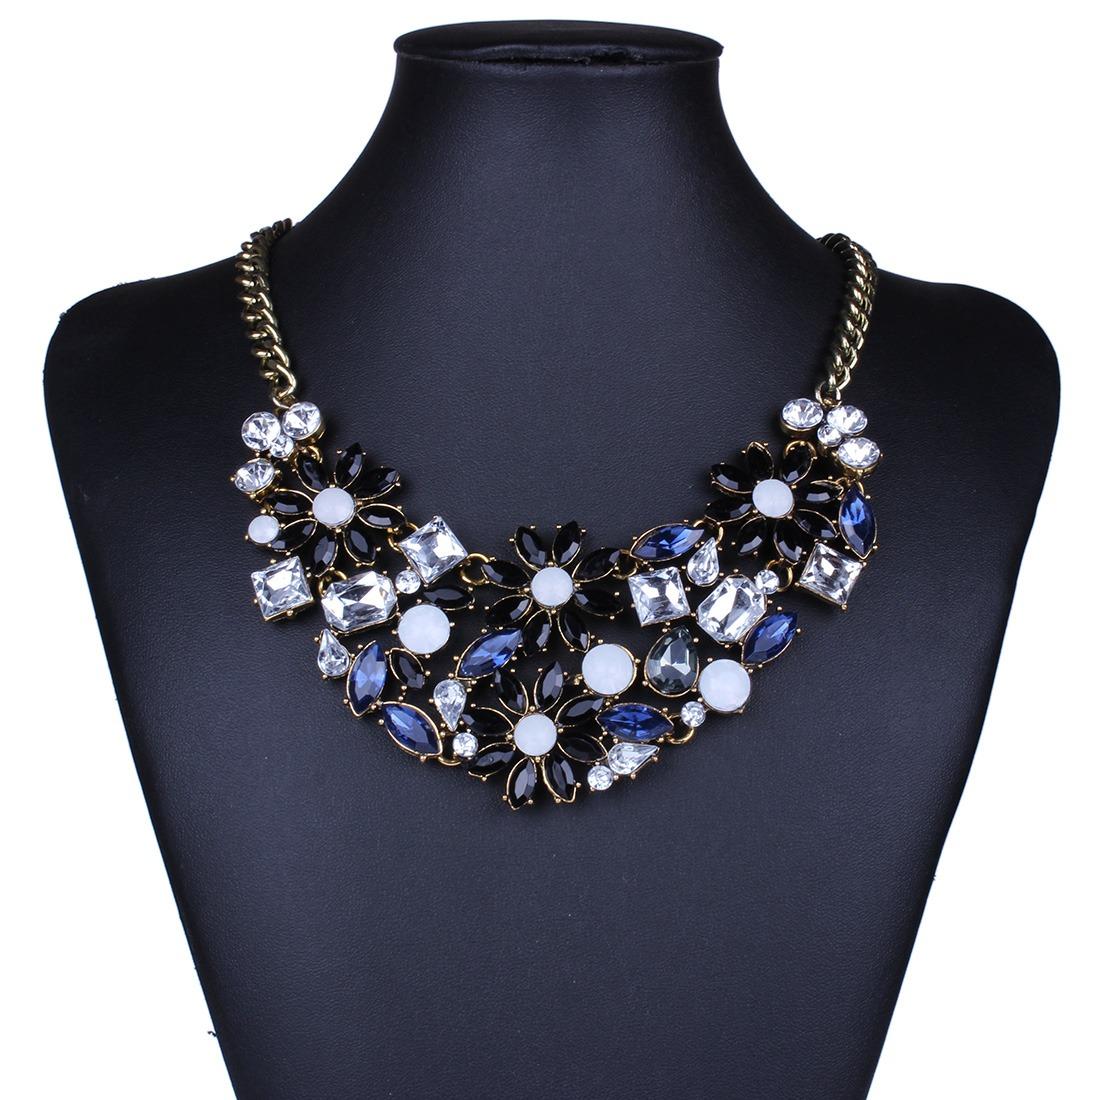 Bling sparkling rhinestone flower chain bib choker statement collar necklace